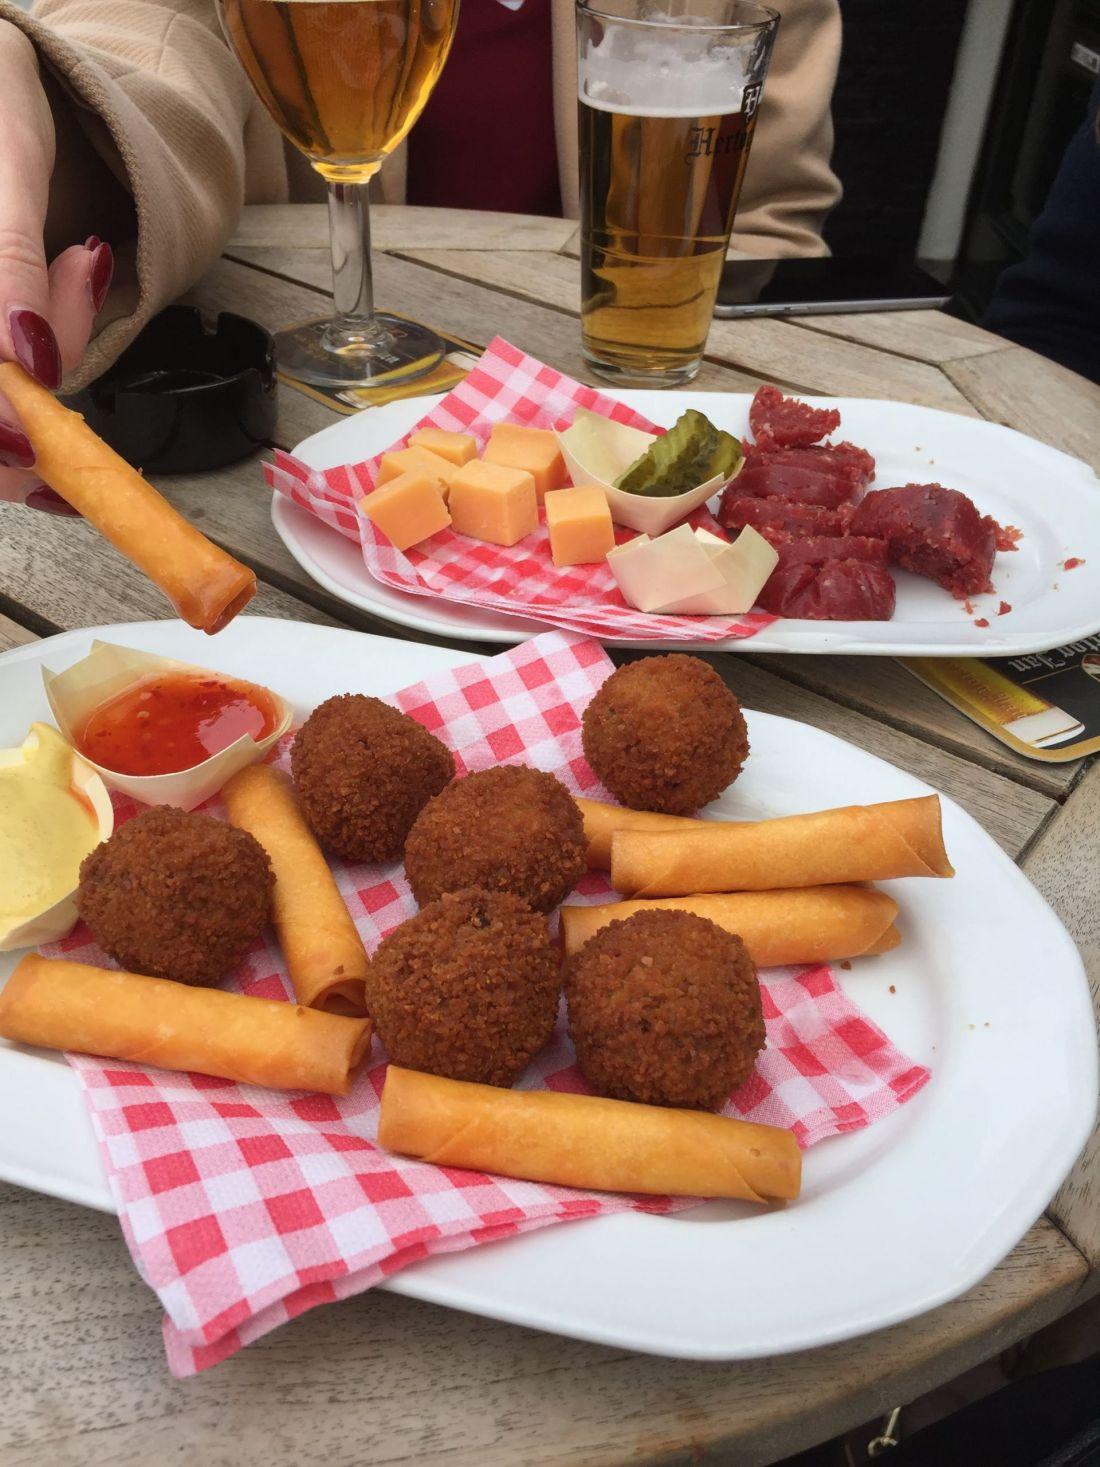 Fried food from Sluyswcht